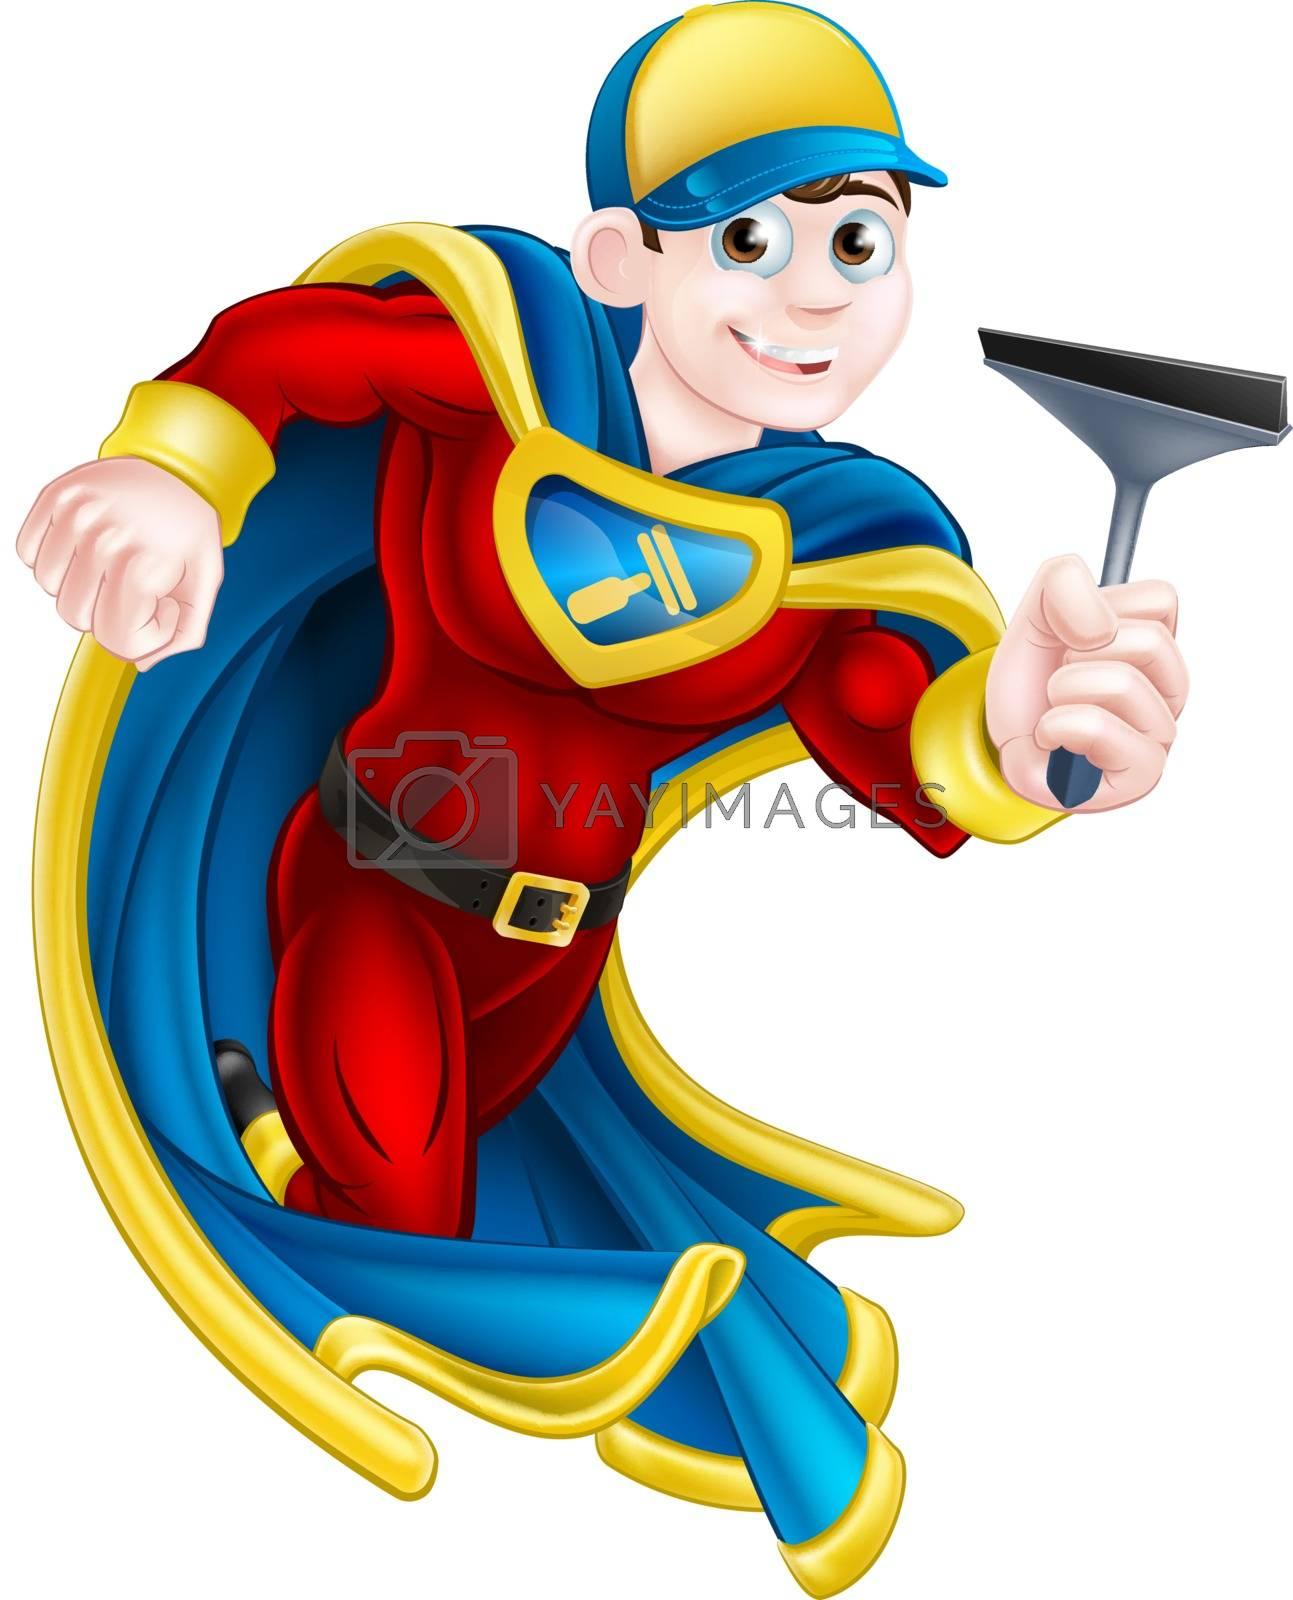 Cartoon window cleaner or car wash man super hero mascot holding a squeegee